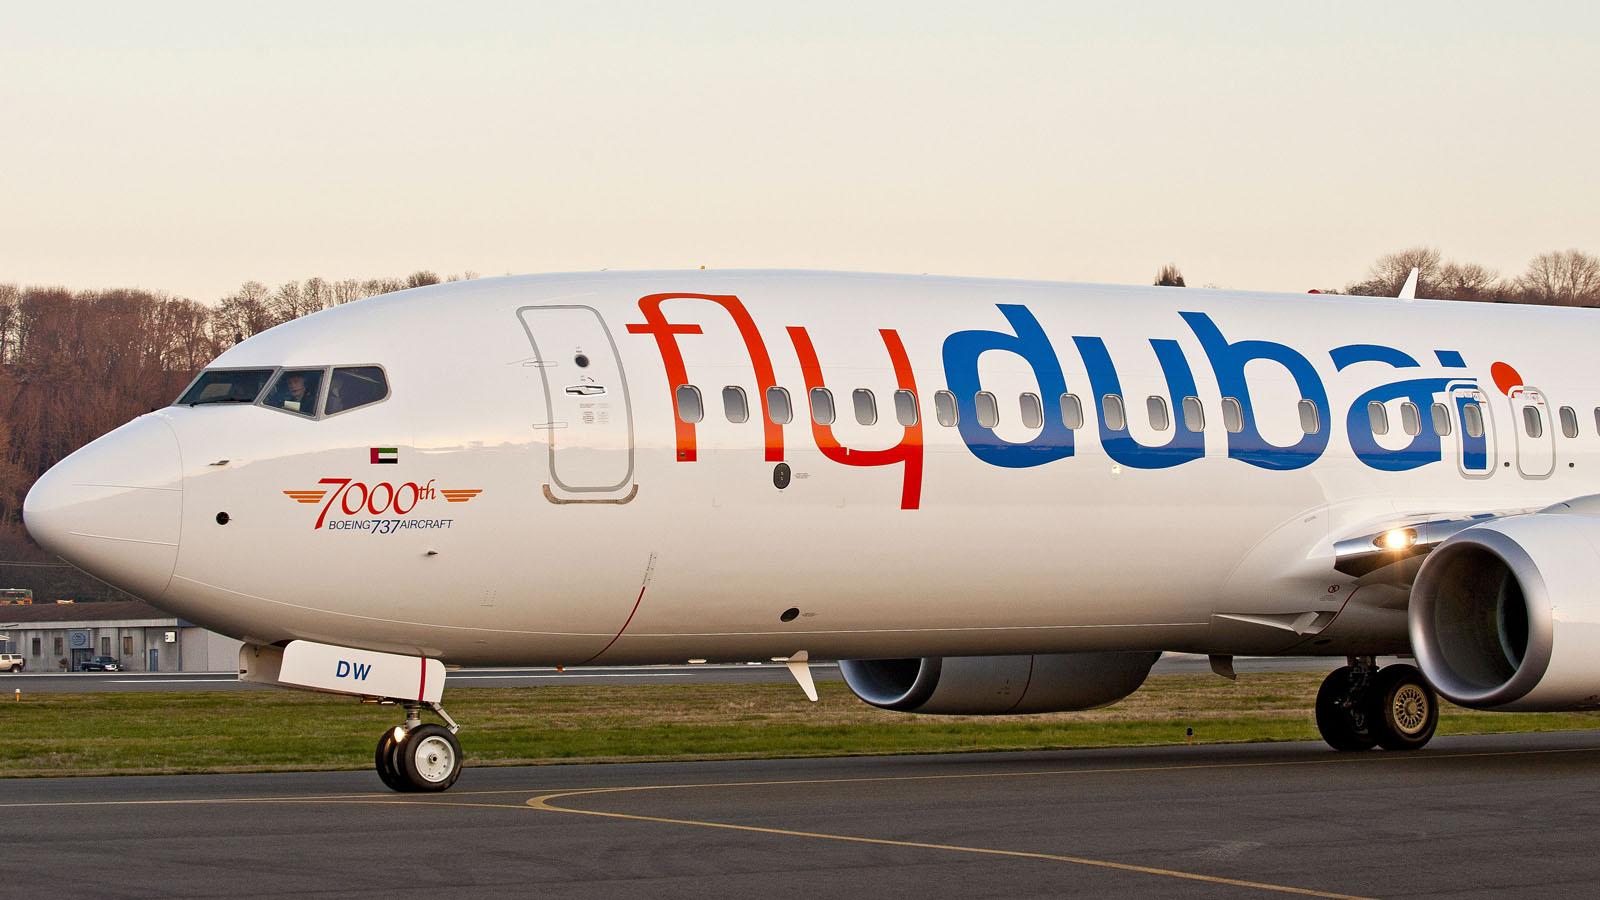 rp_7000th-Boeing-737-Fly-Dubai-728x409.jpg »